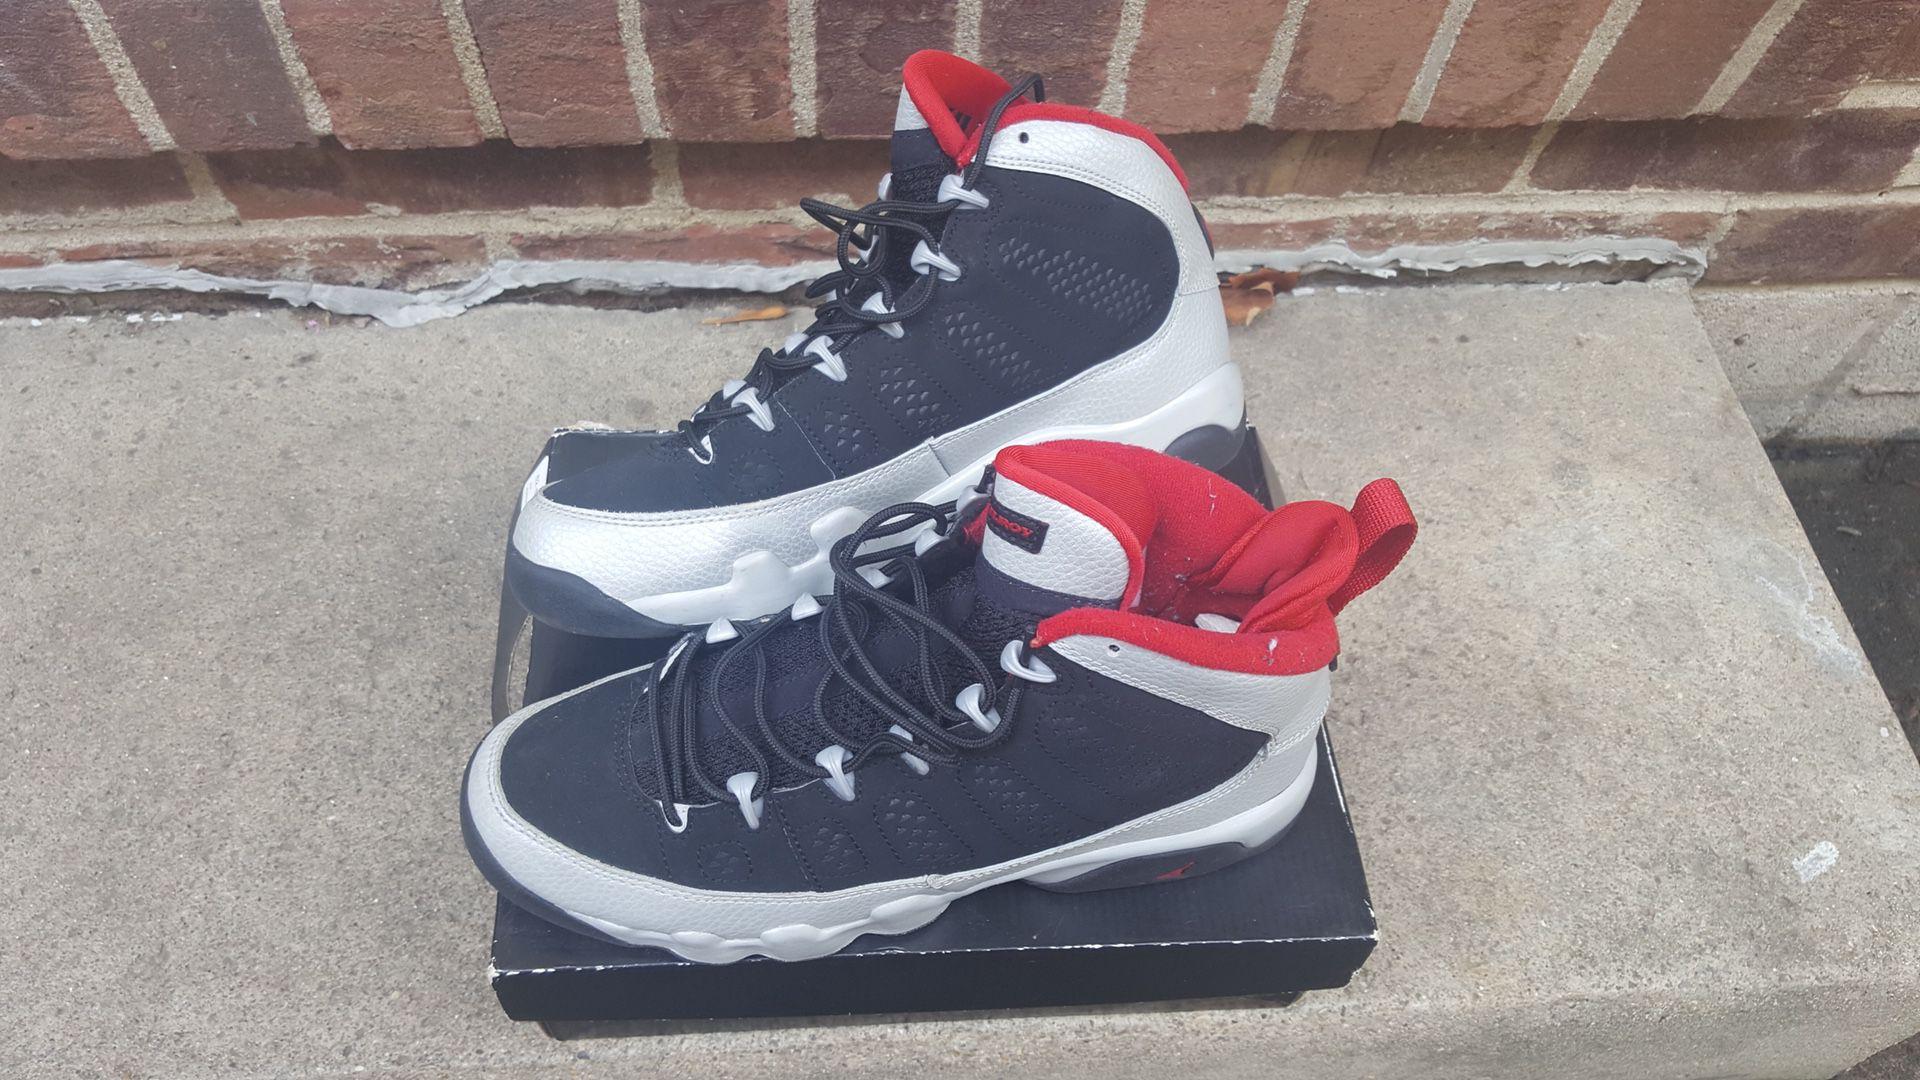 Air Jordan 9 Retro Johnny Kilroy